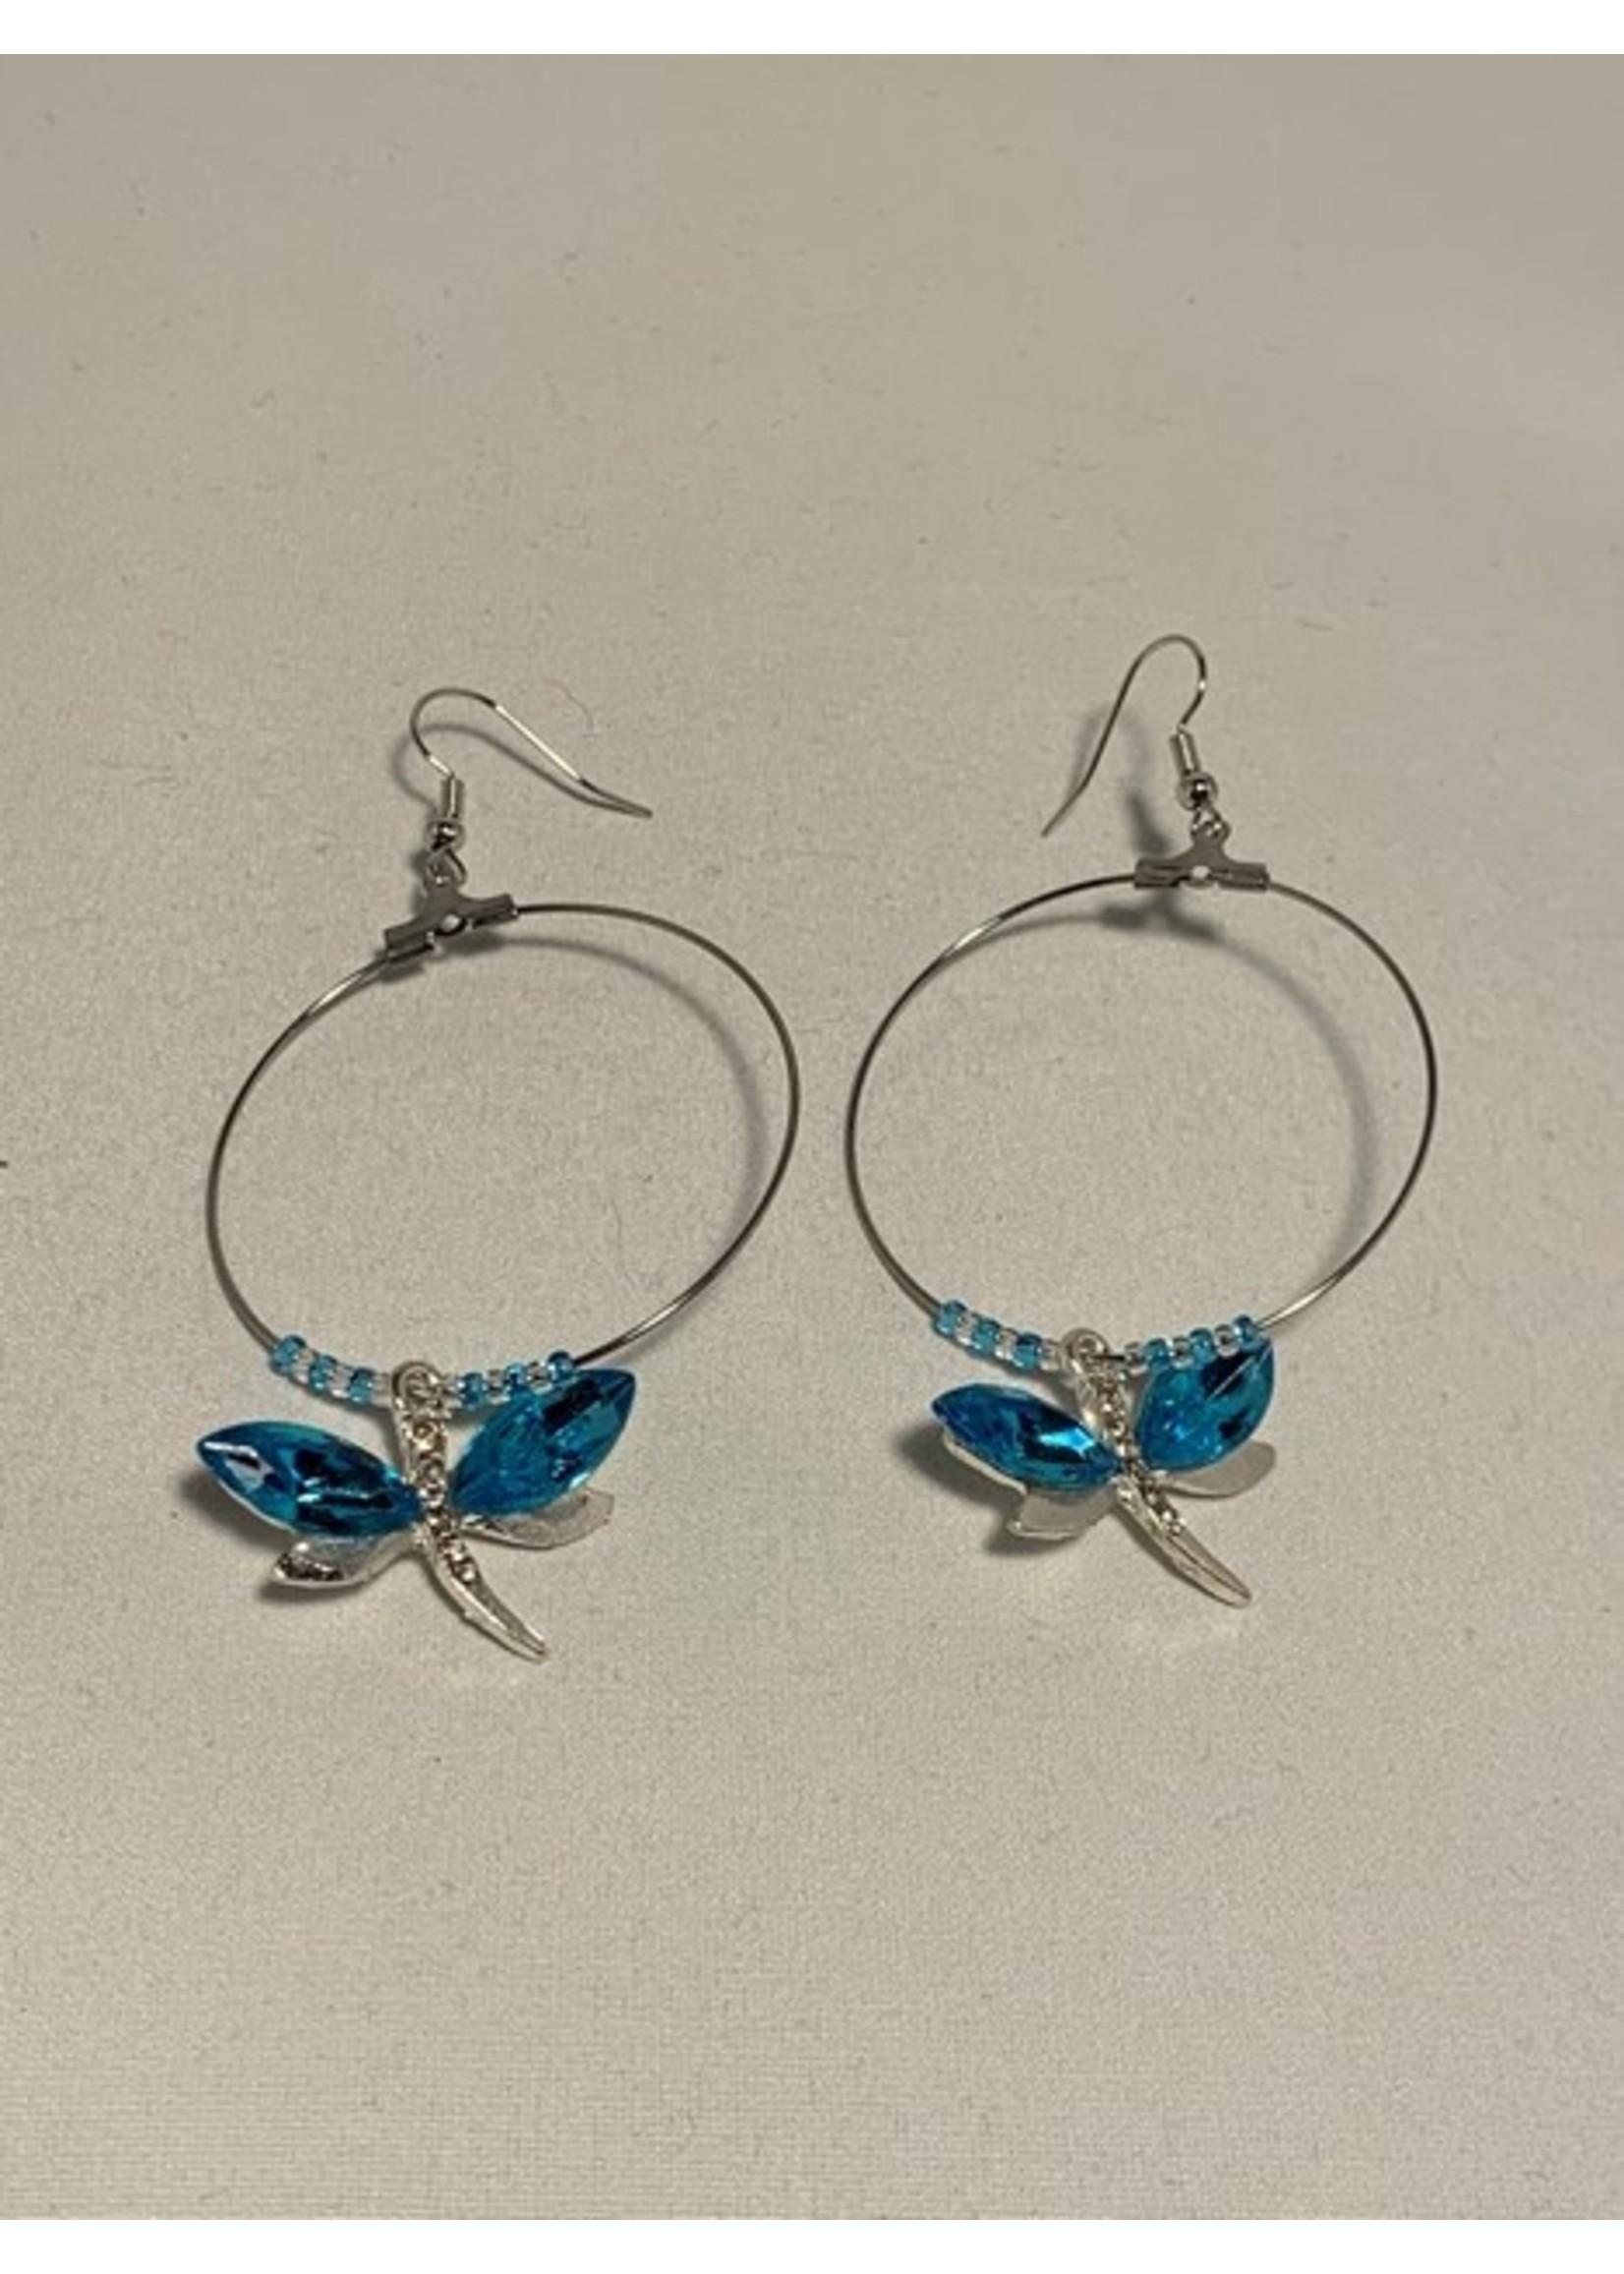 Large Hoop Earrings Light Blue Dragonfly (SOLD)